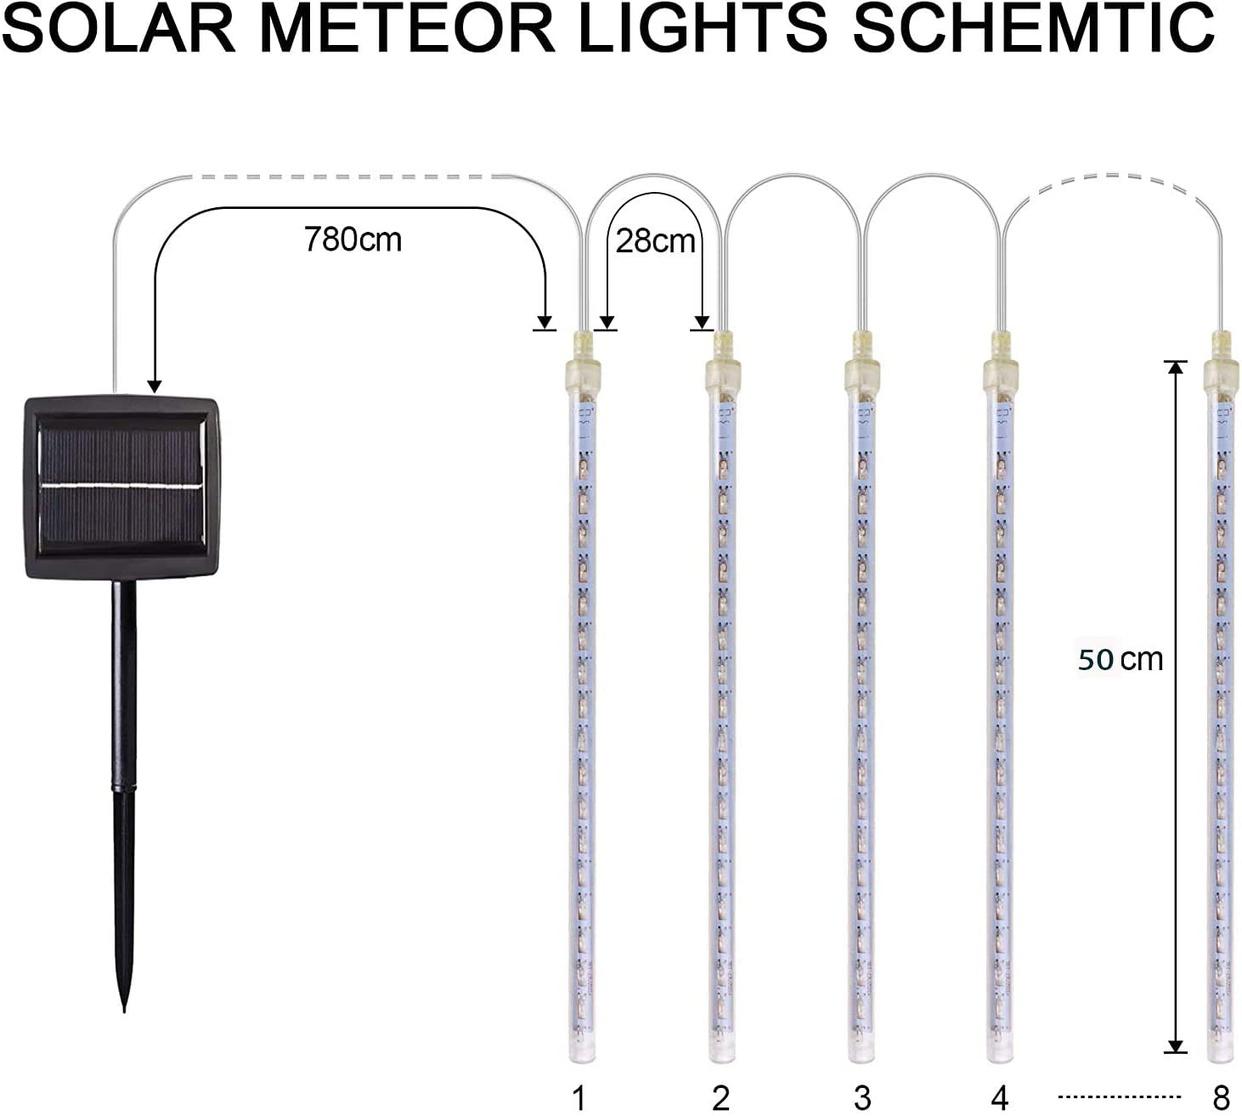 MYJP(エムワイジェーピー) ソーラーLEDイルミネーションライトの商品画像2